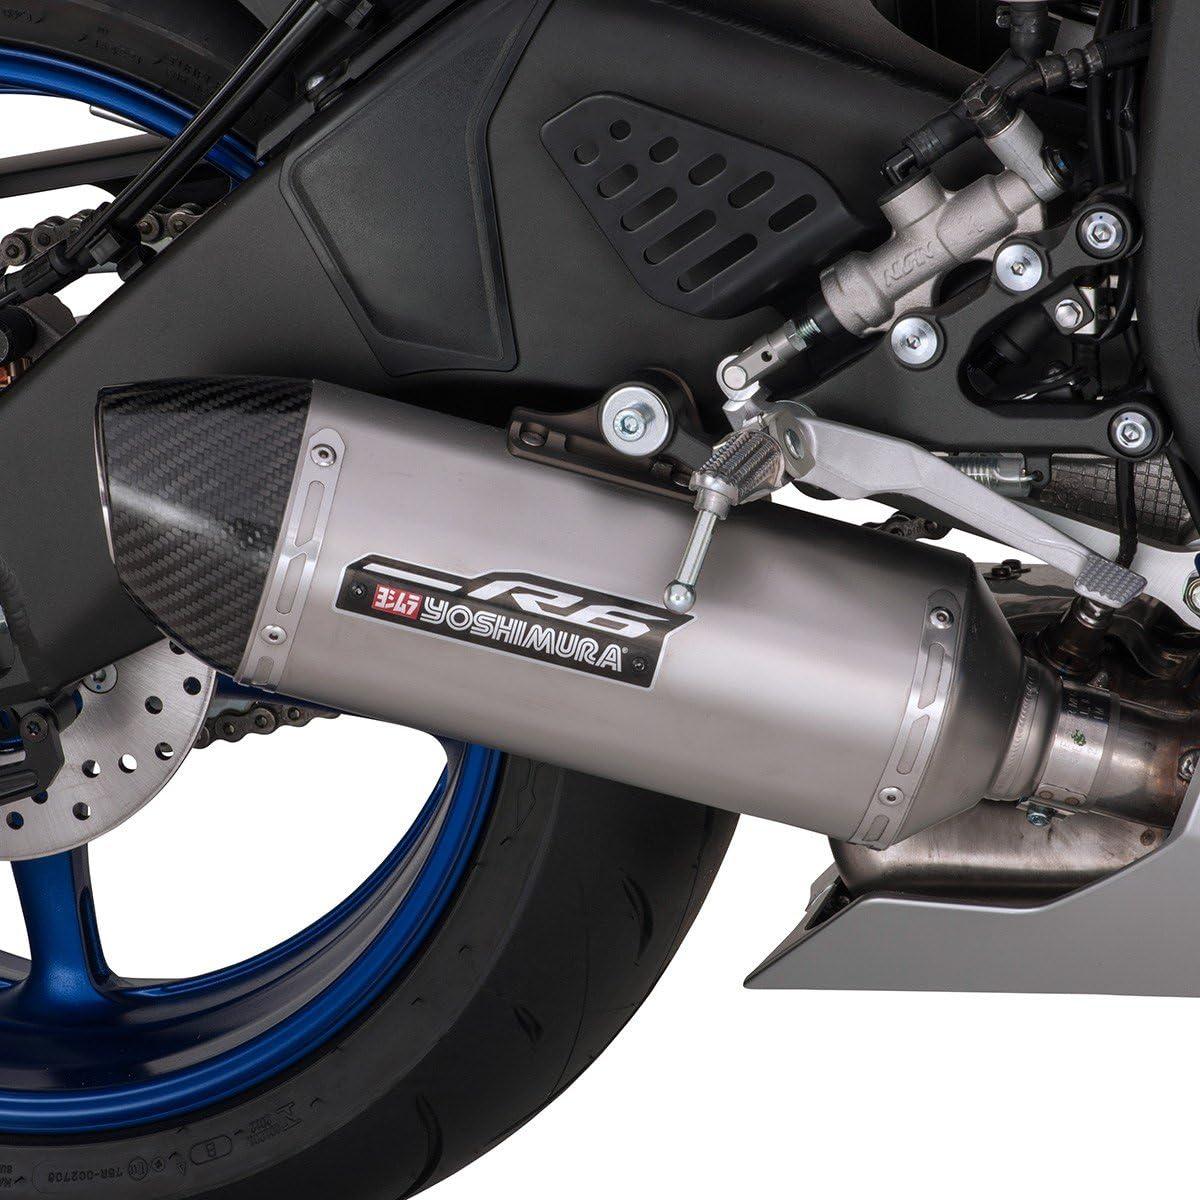 2009-2020 Genuine Yamaha YZF-R6 Yoshimura Y-Series Slip-On Muffler BN6E47A0V000